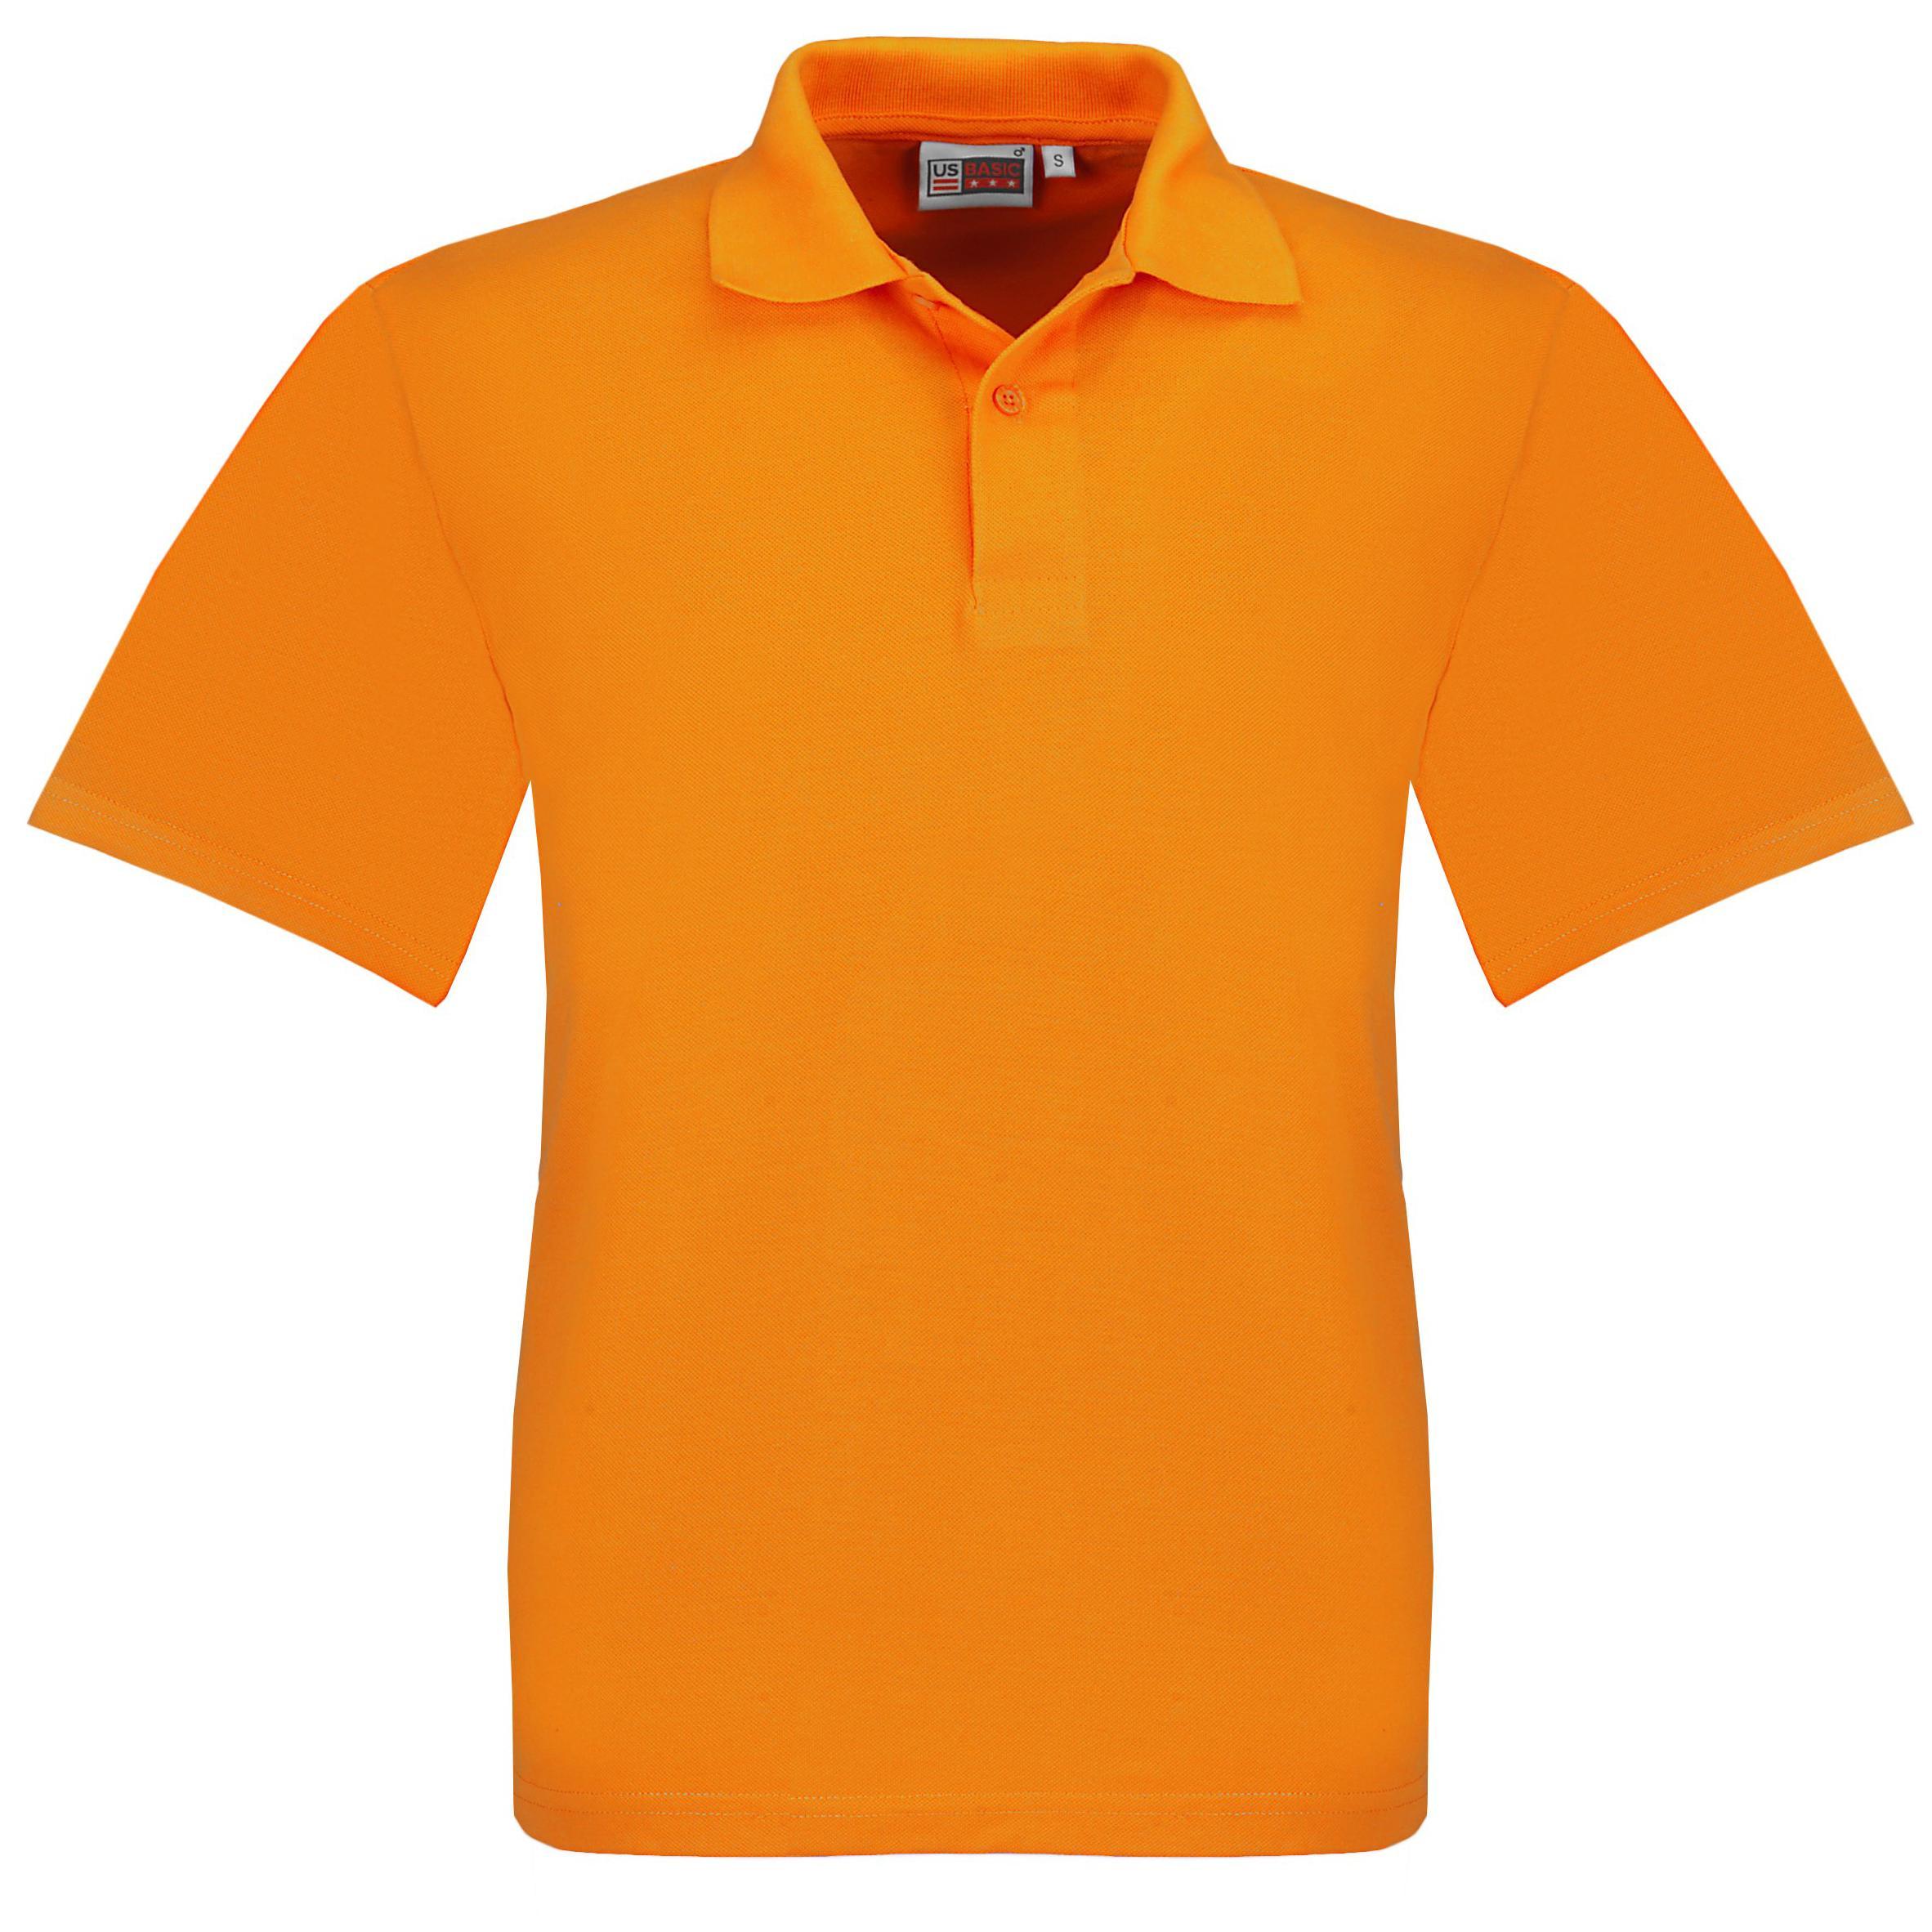 Mens Elemental Golf Shirt - Orange Only